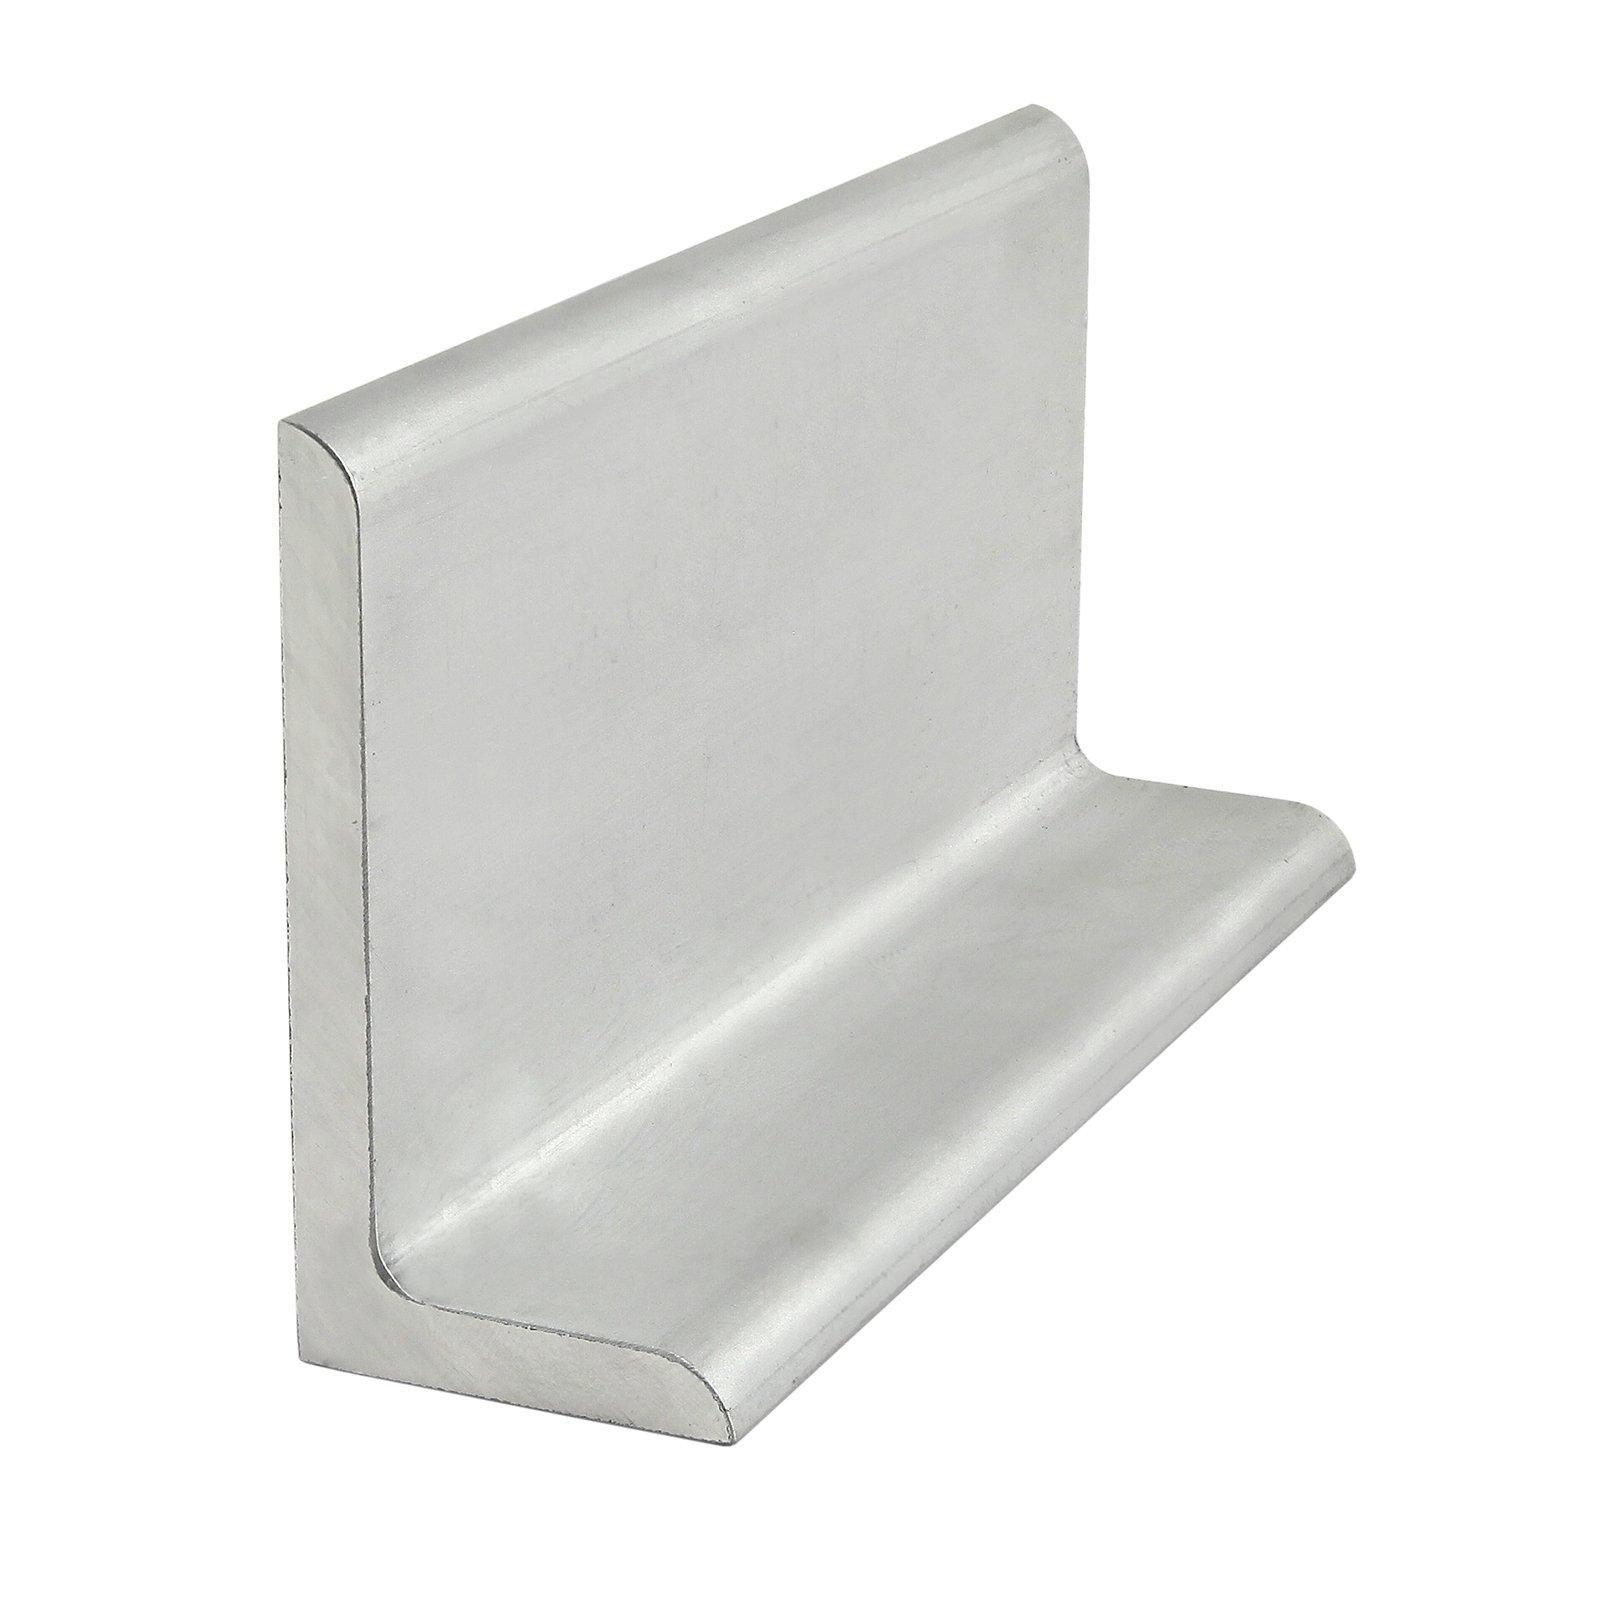 80/20 Inc., 8213, Angle Profile, 1'' x 2'' x .188'' Angled Shape x 48'' Long Mill-Finish